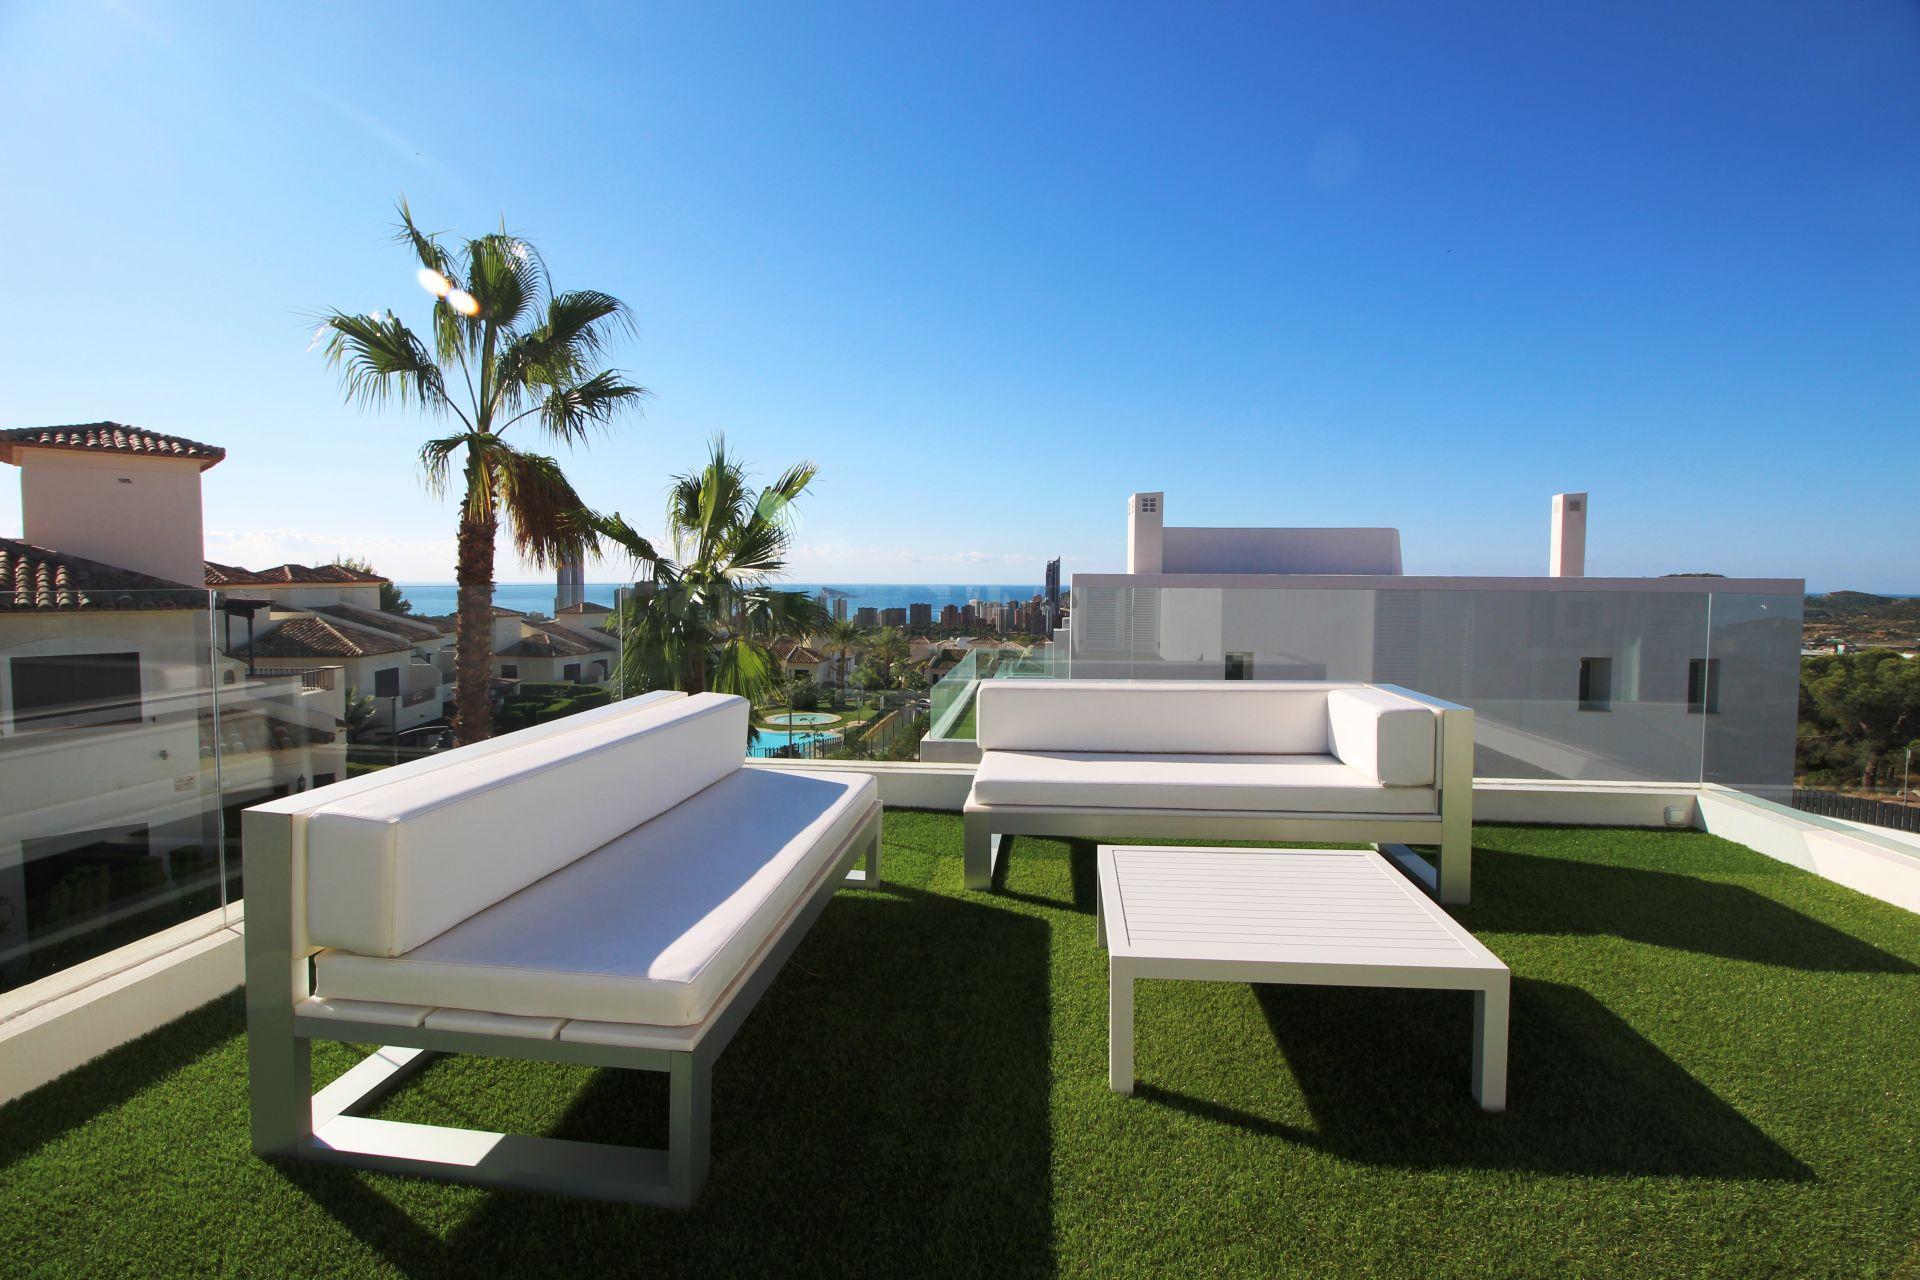 Exclusive villas with 3 bedrooms in Finestrat 6